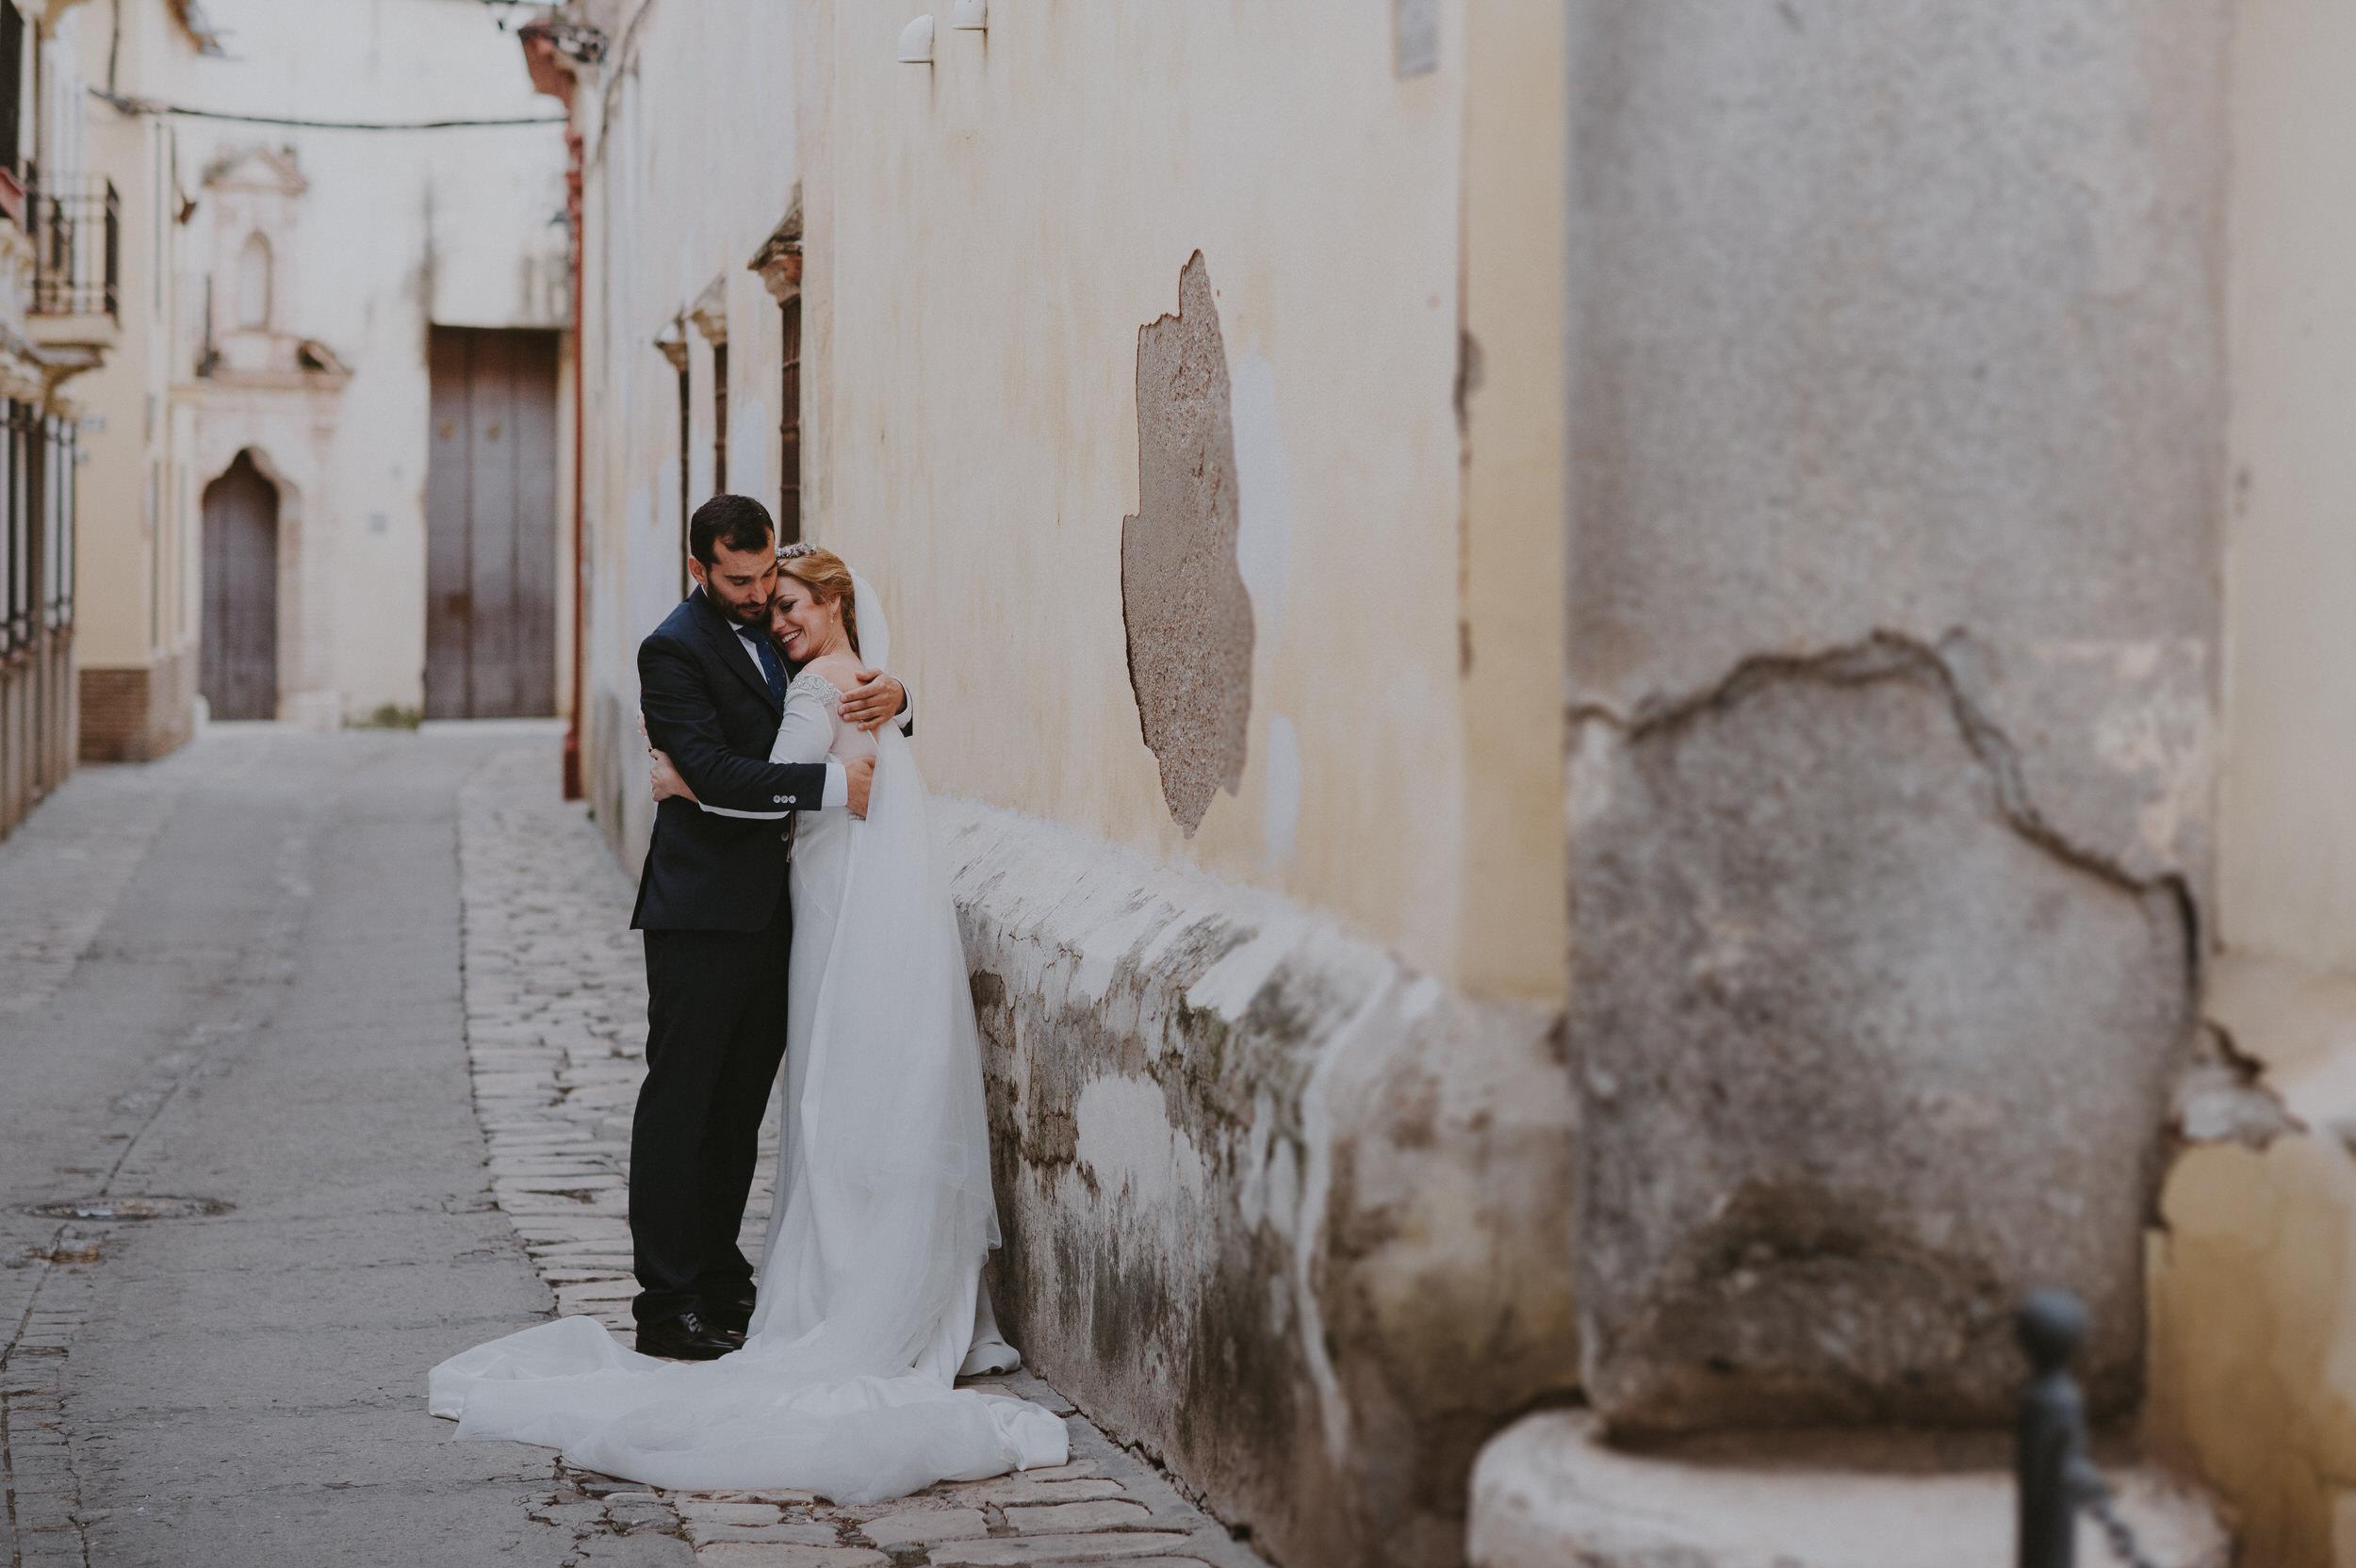 Cristina & Jero - Boda en Ecija - Iglesia Santa Ana - Fotógrafo Andrés Amarillo (44).JPG